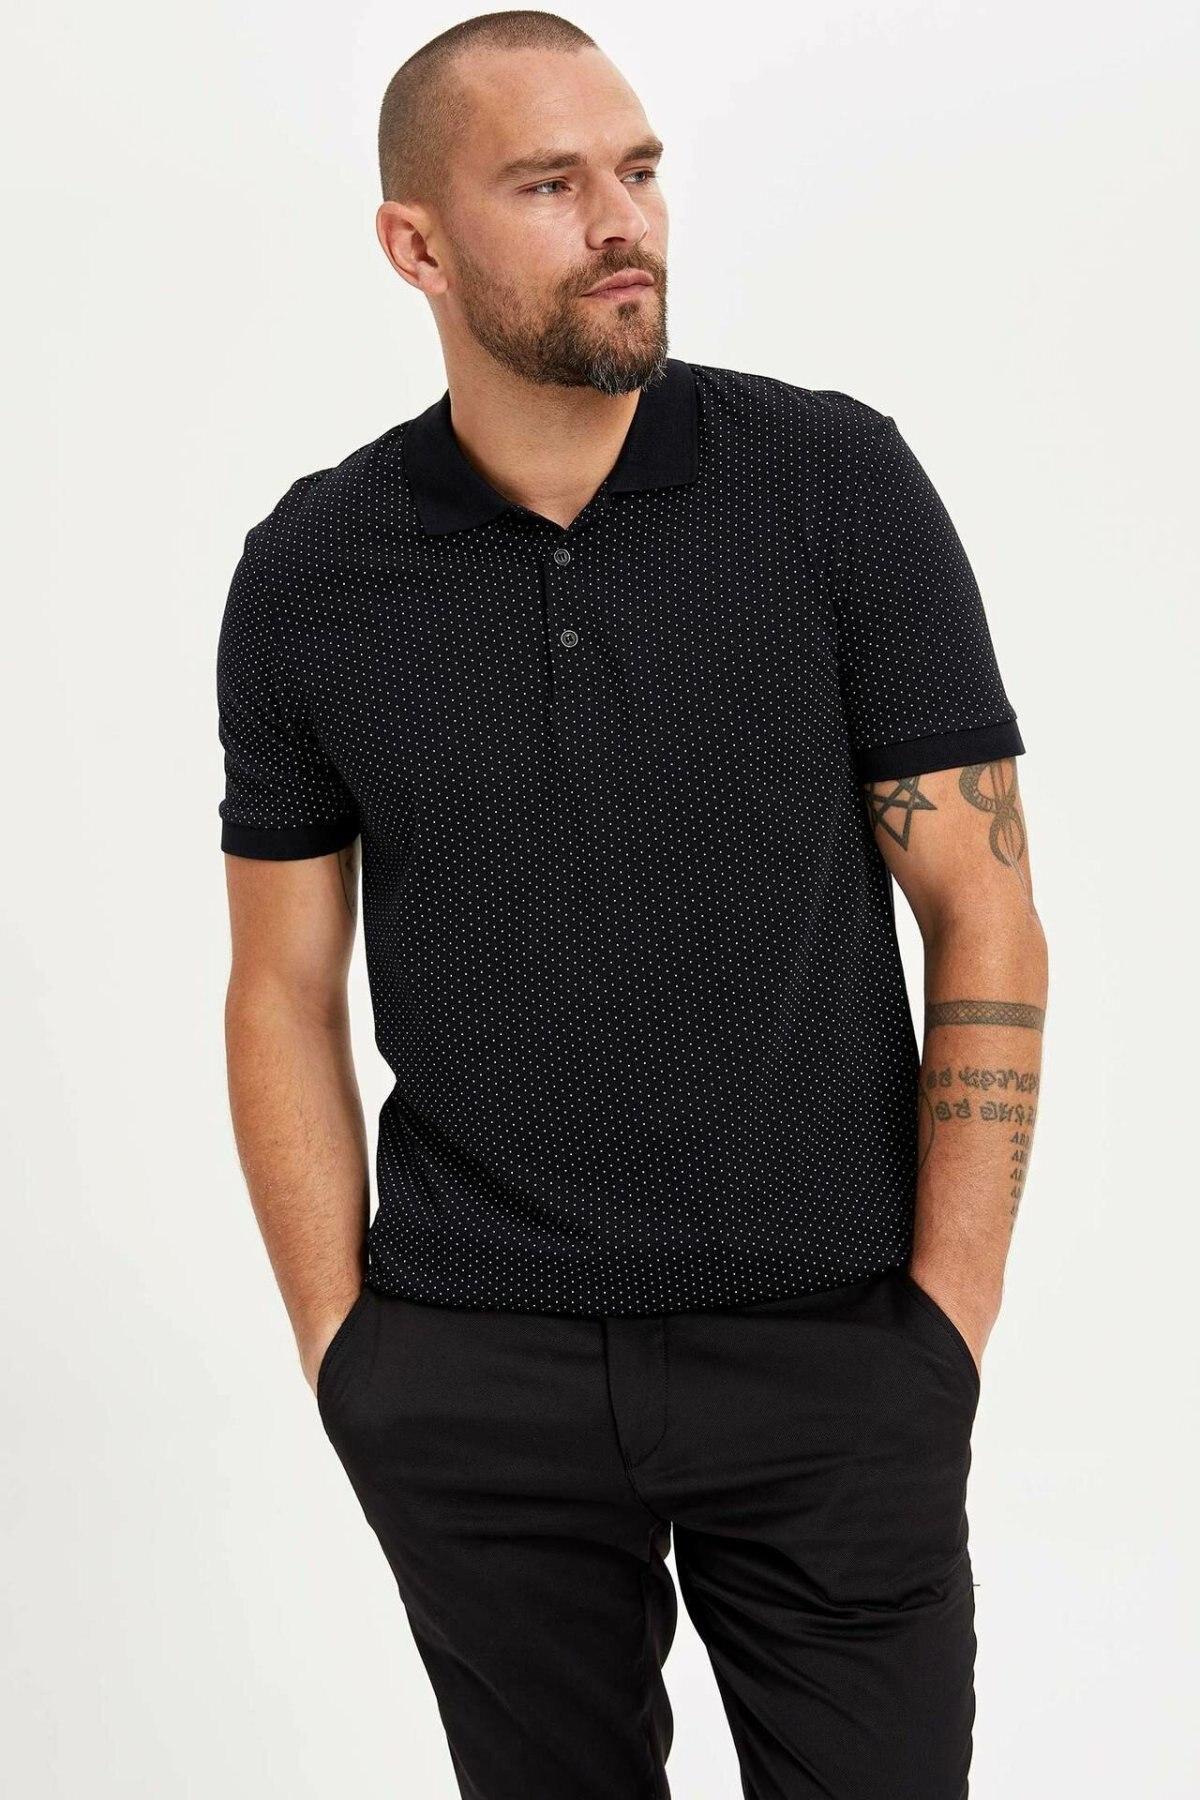 DeFacto Men Summer Solid Color Fit Cotton Top Tees Shirt Male Casual Black Pink Fashion Short Sleeve Male Shirt-L4772AZ19SM